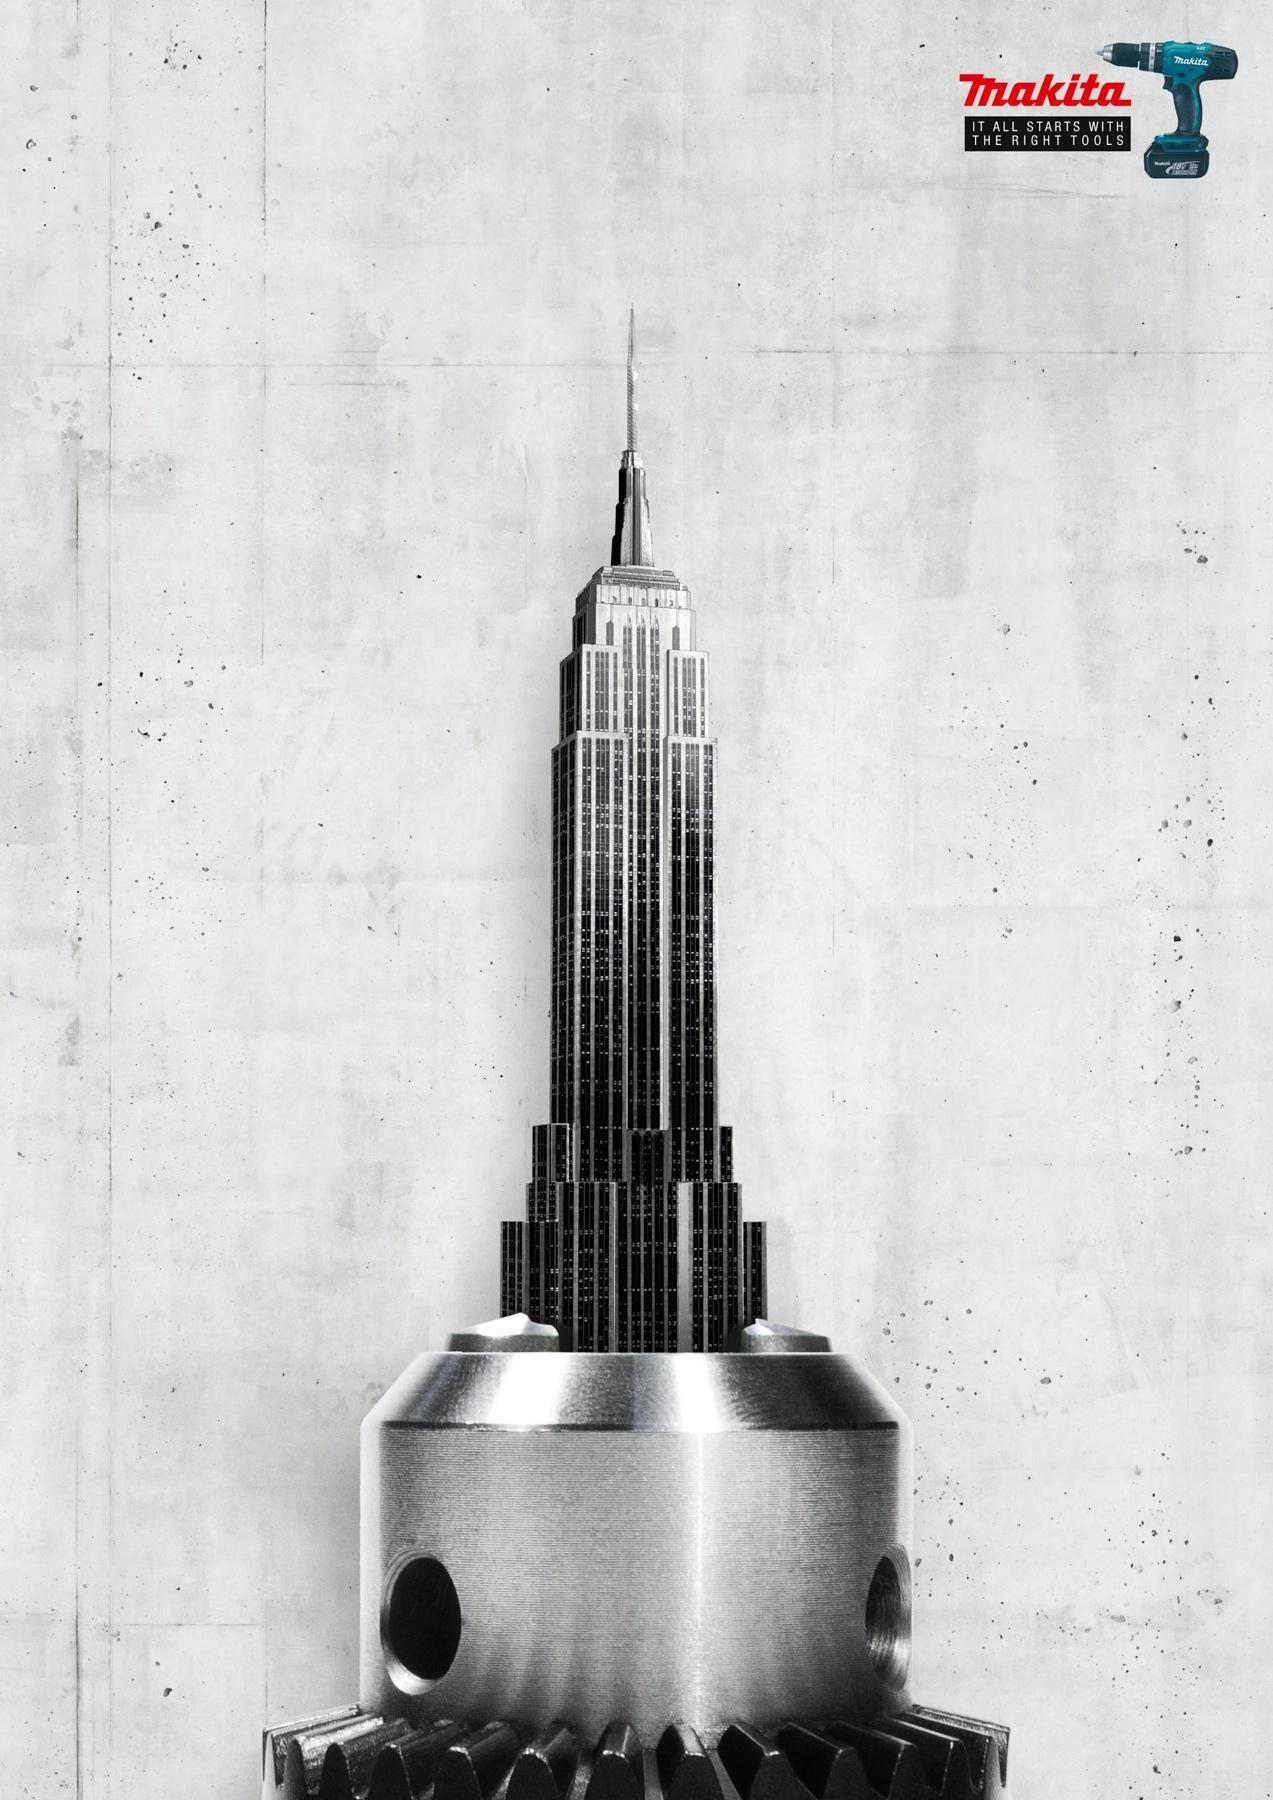 Makita Print Ad -  Empire State Building